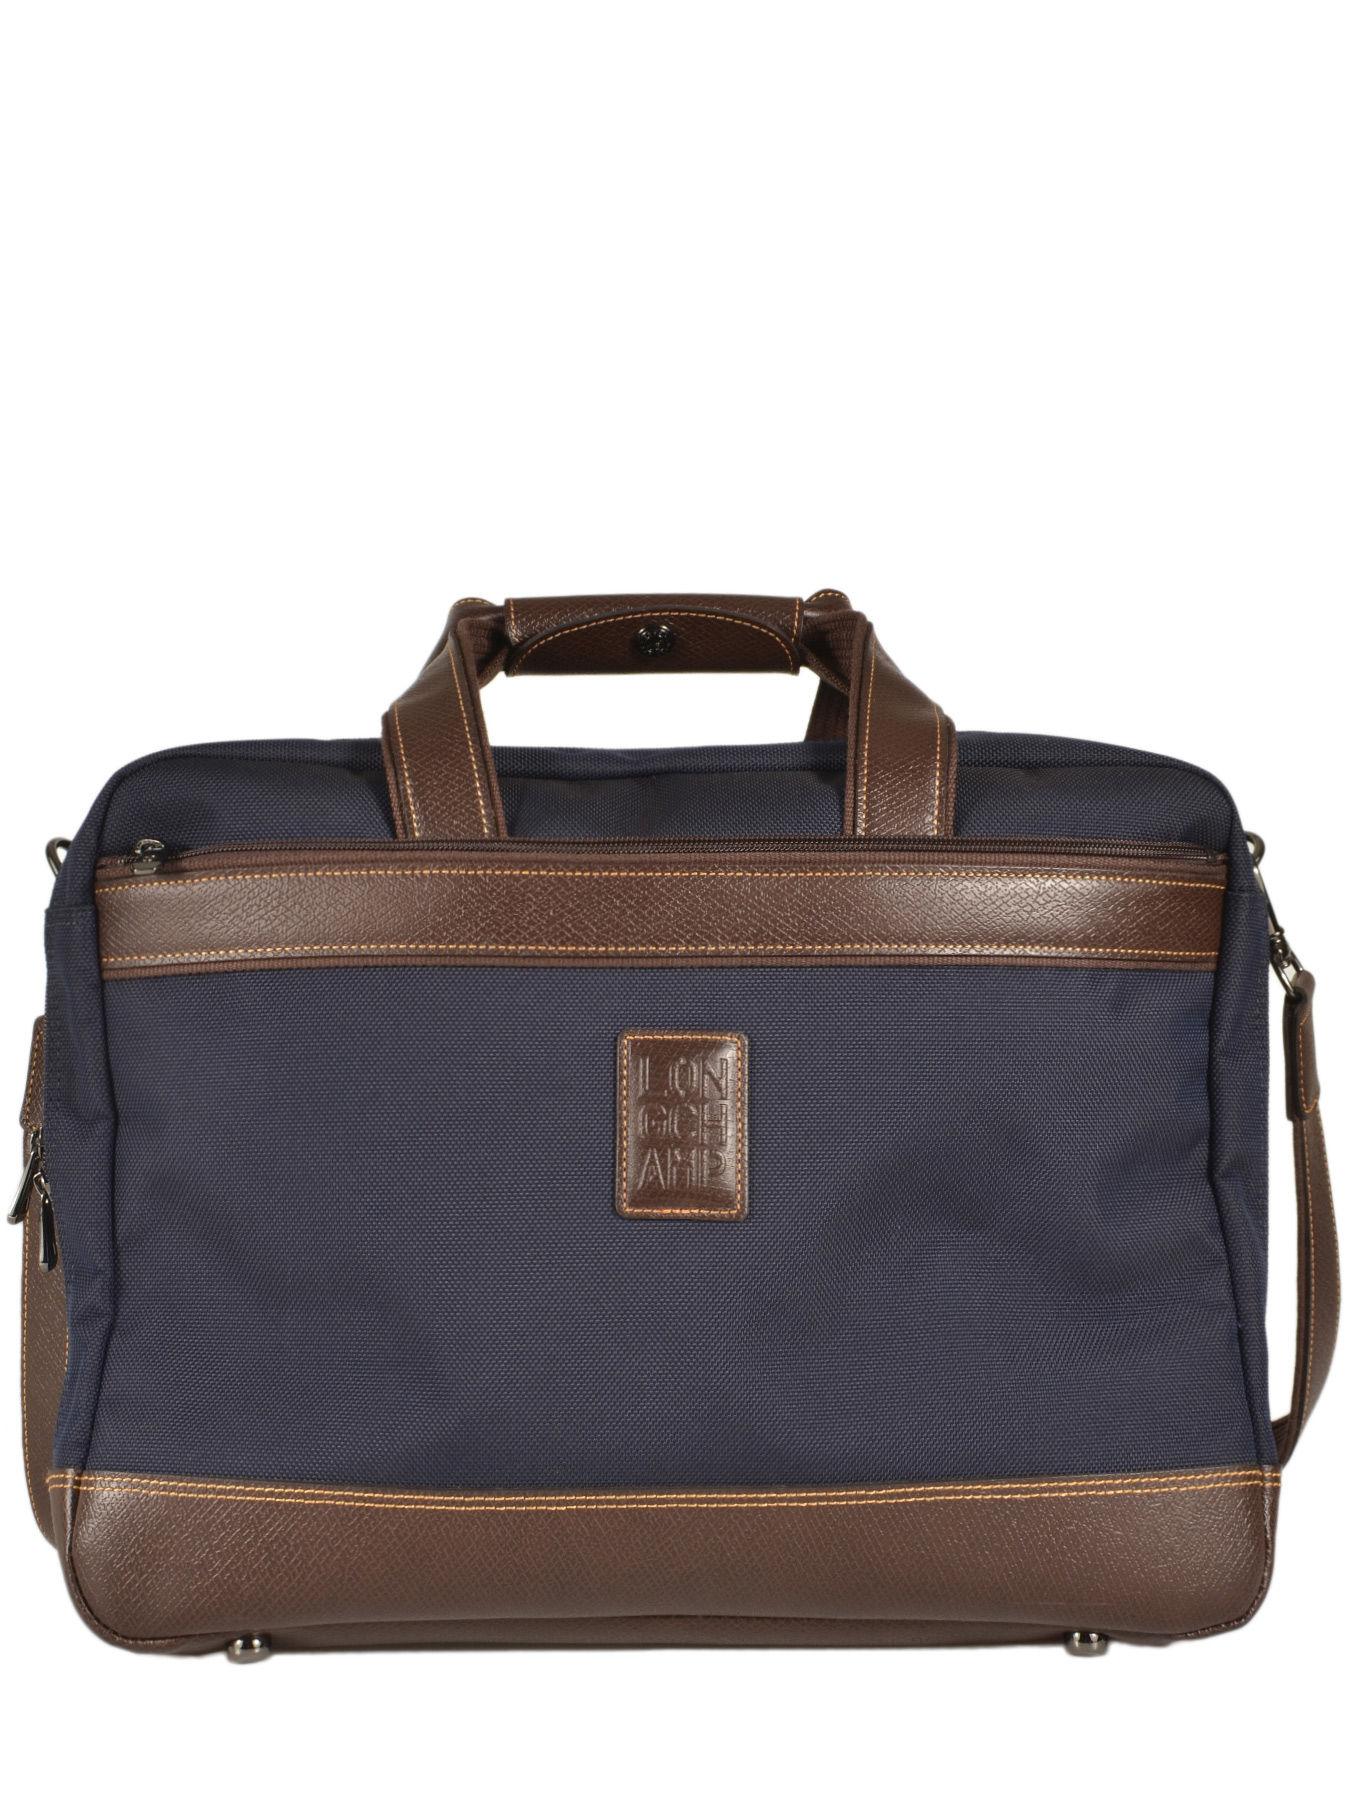 Shopping > sac longchamp cartable, Up to 78% OFF